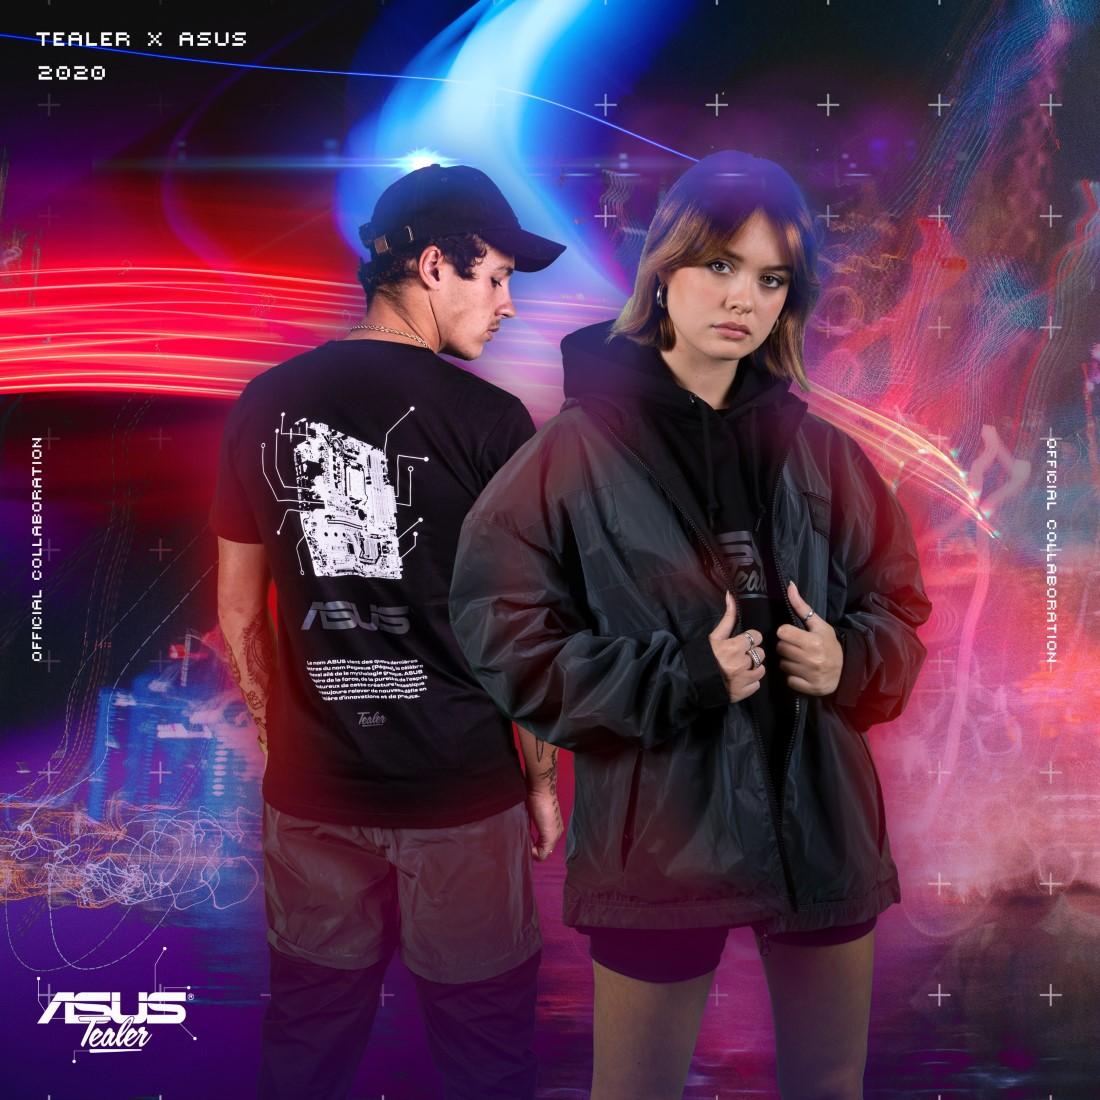 ASUS x Tealer